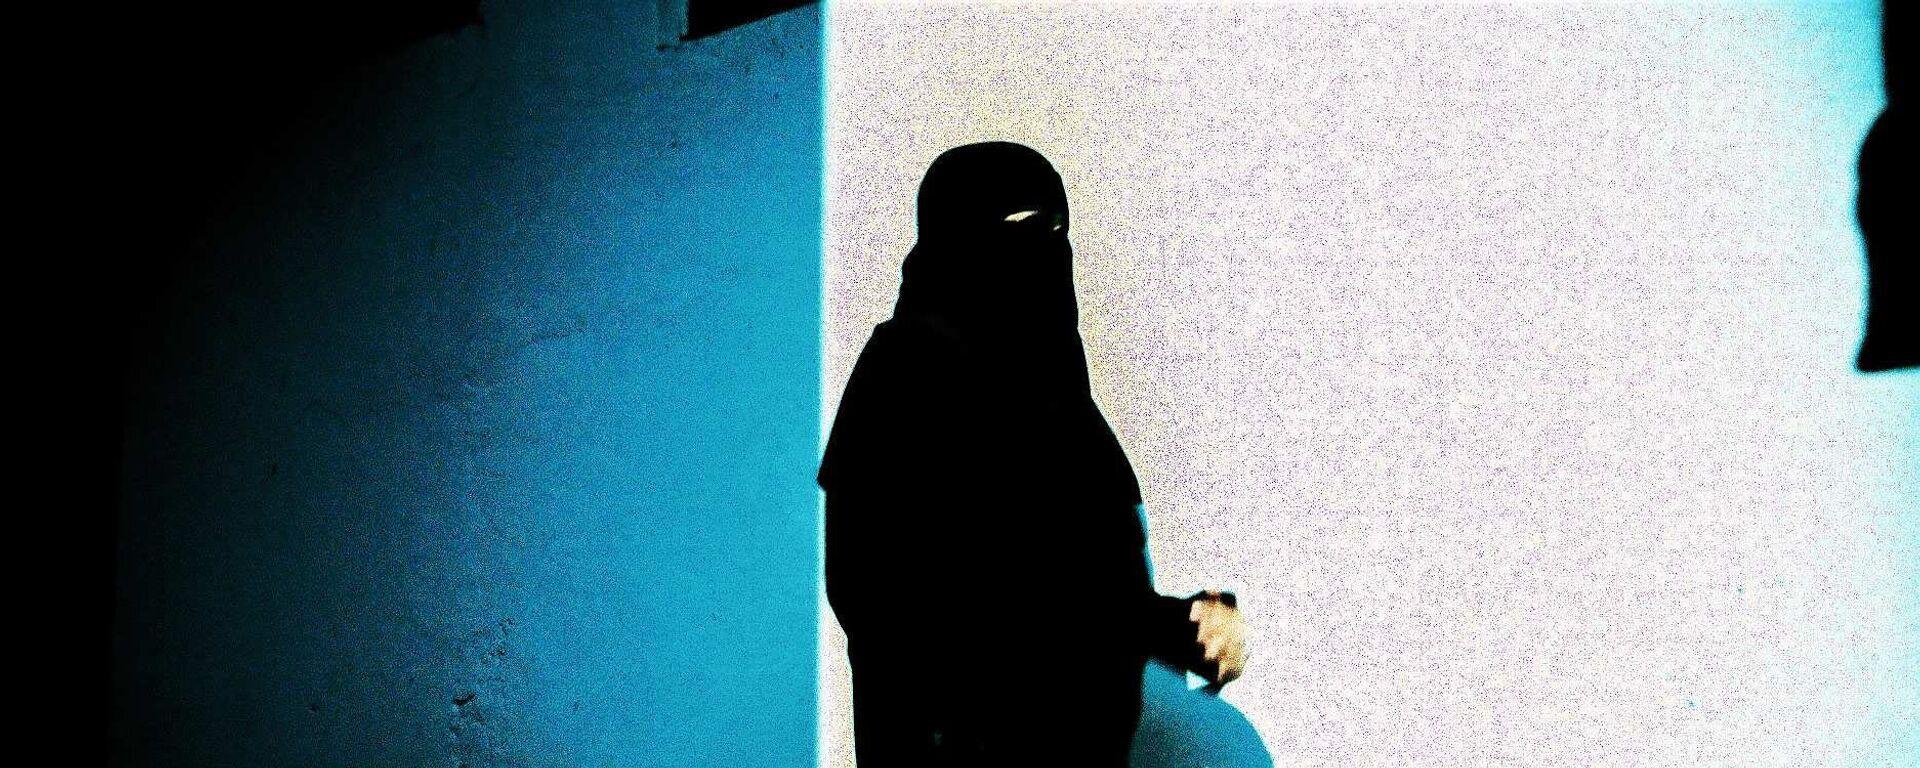 Una donna musulmana - Sputnik Italia, 1920, 26.08.2021